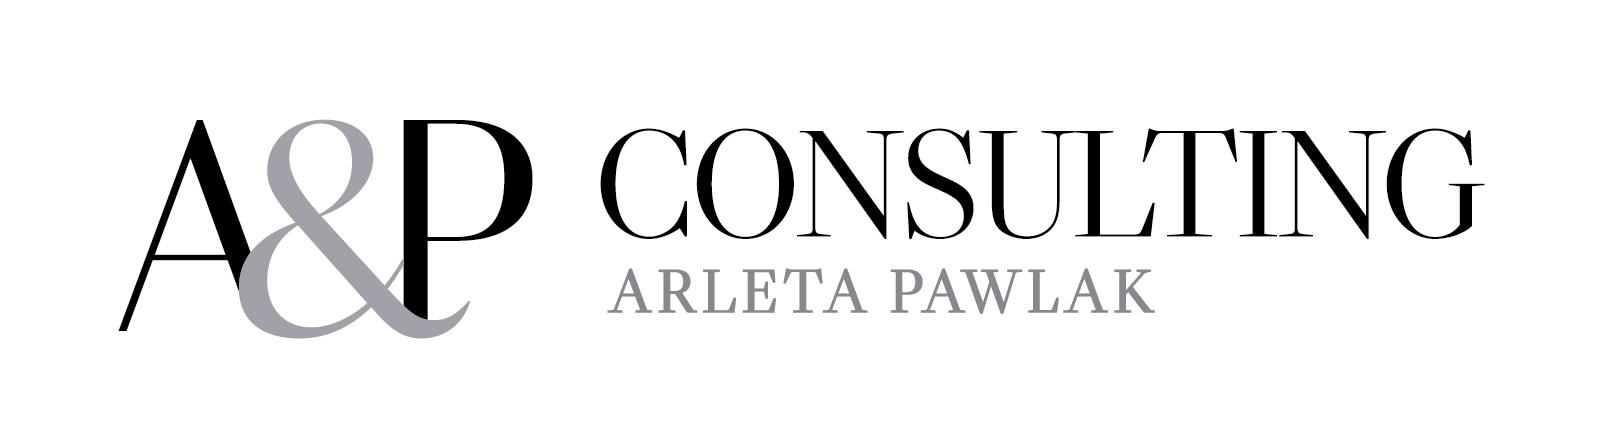 "Logo ""A&P CONSULTING"" ARLETA PAWLAK"